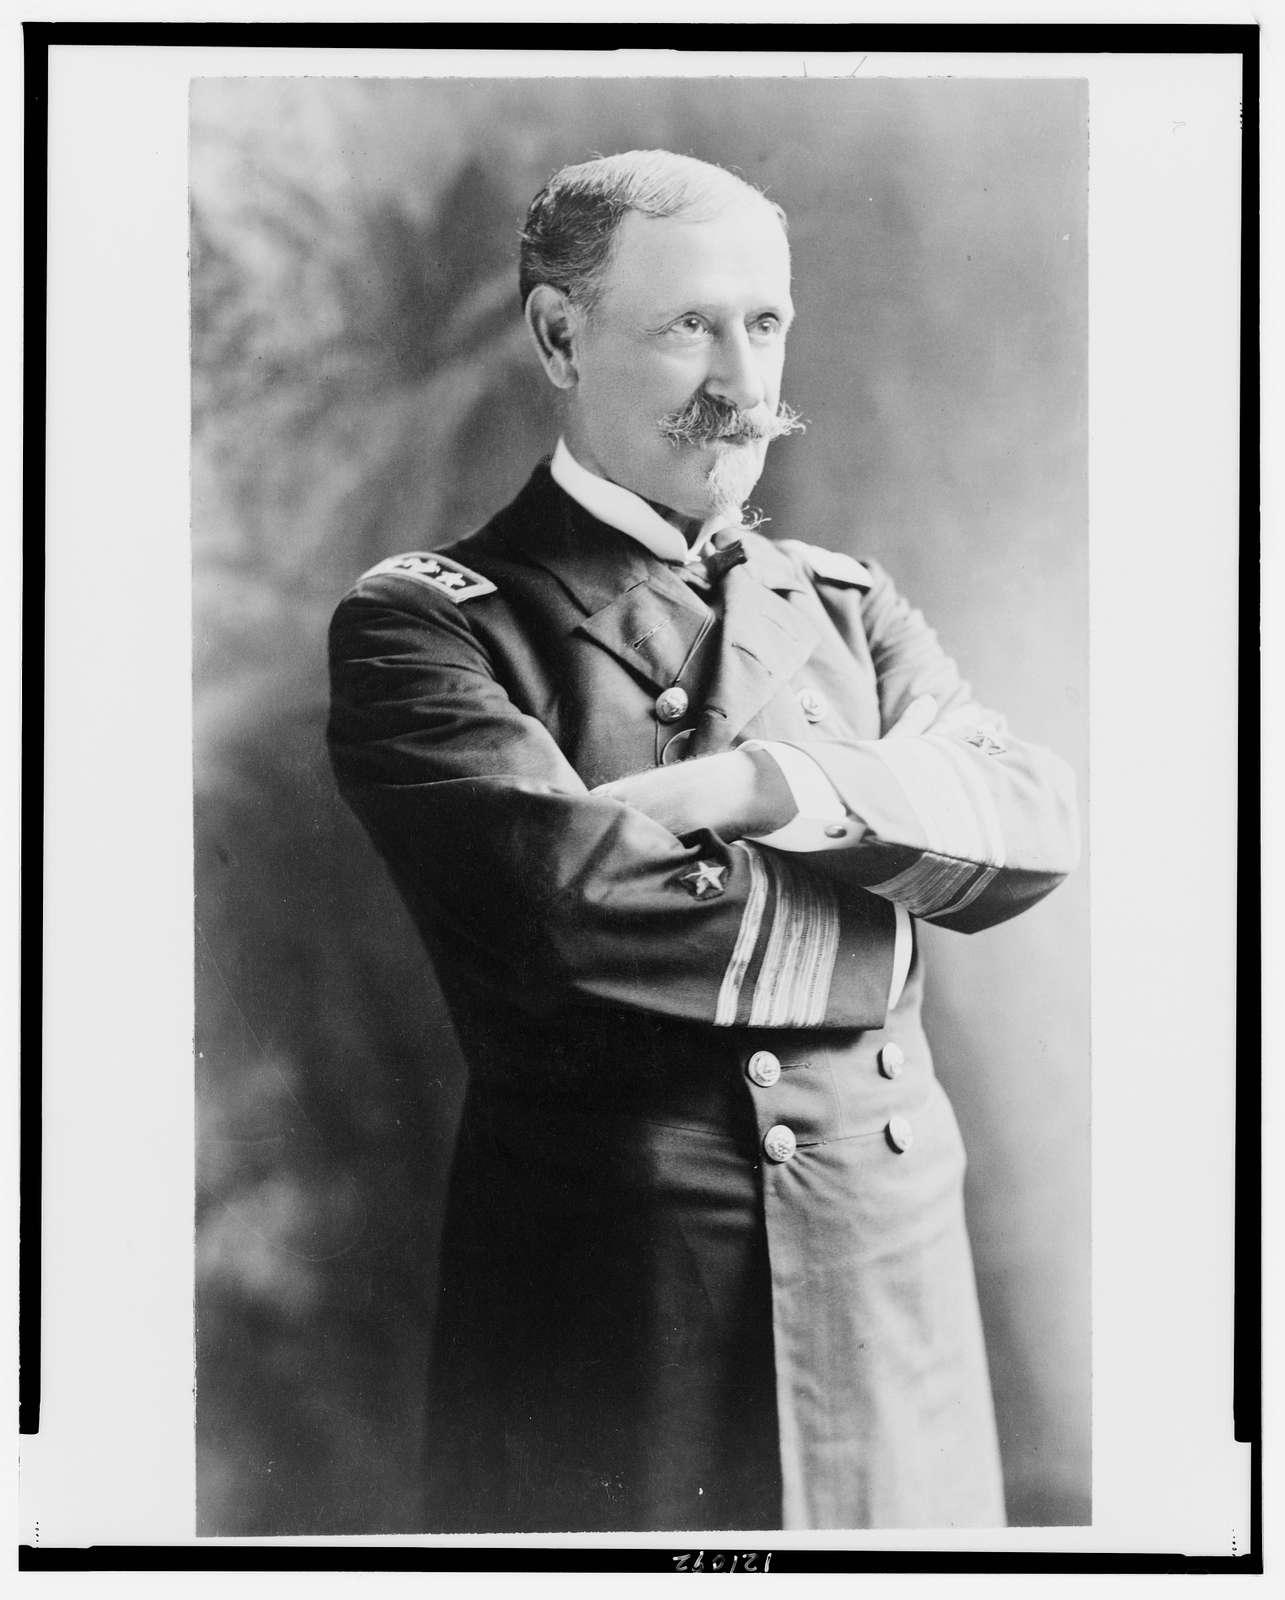 [Winfield Scott Schley, half-length portrait, standing, facing right, in uniform]